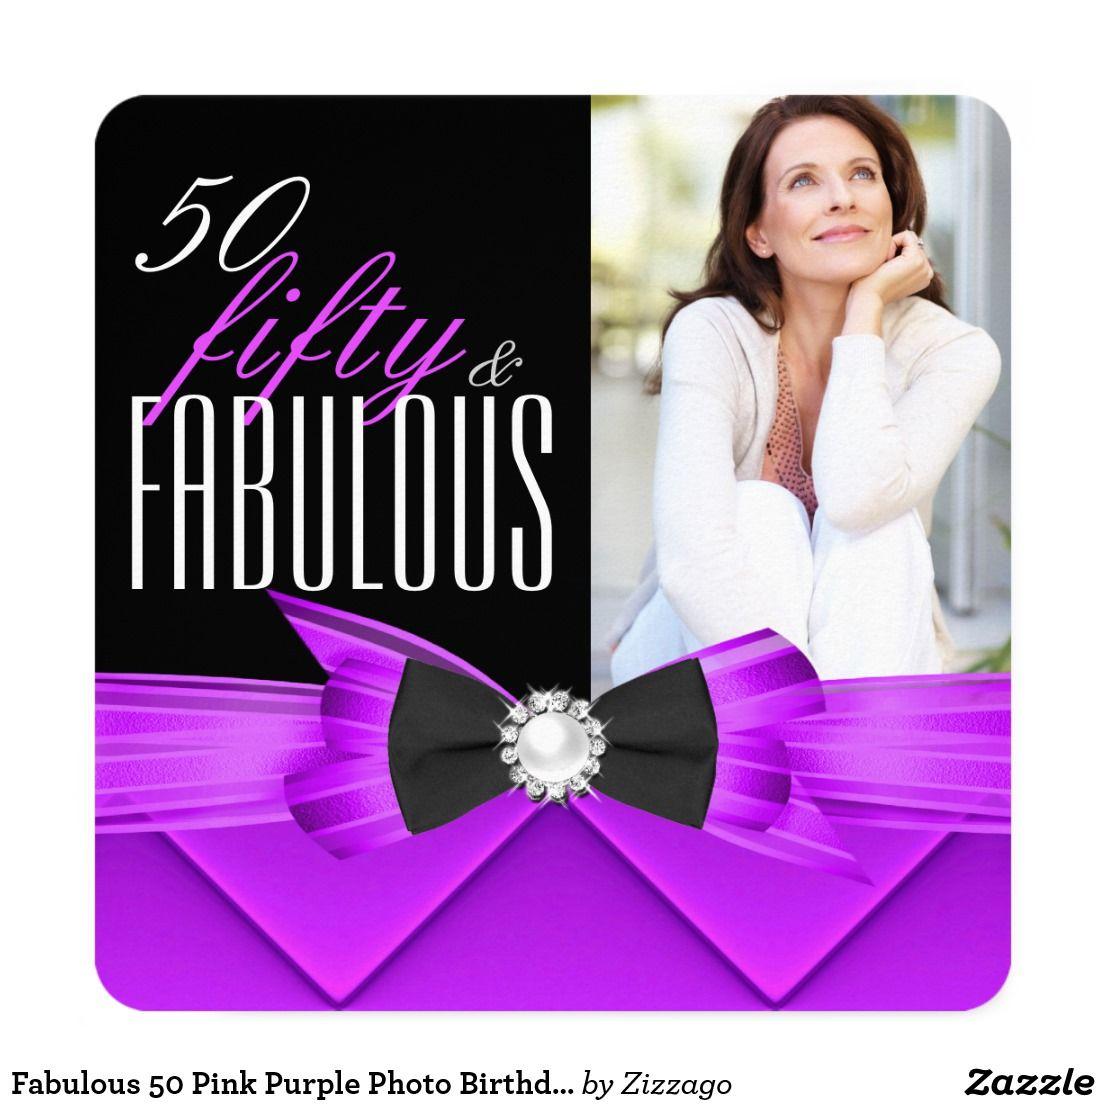 Fabulous 50 Pink Purple Photo Birthday Party Card Black And White Elegant Modern Stylish 50th